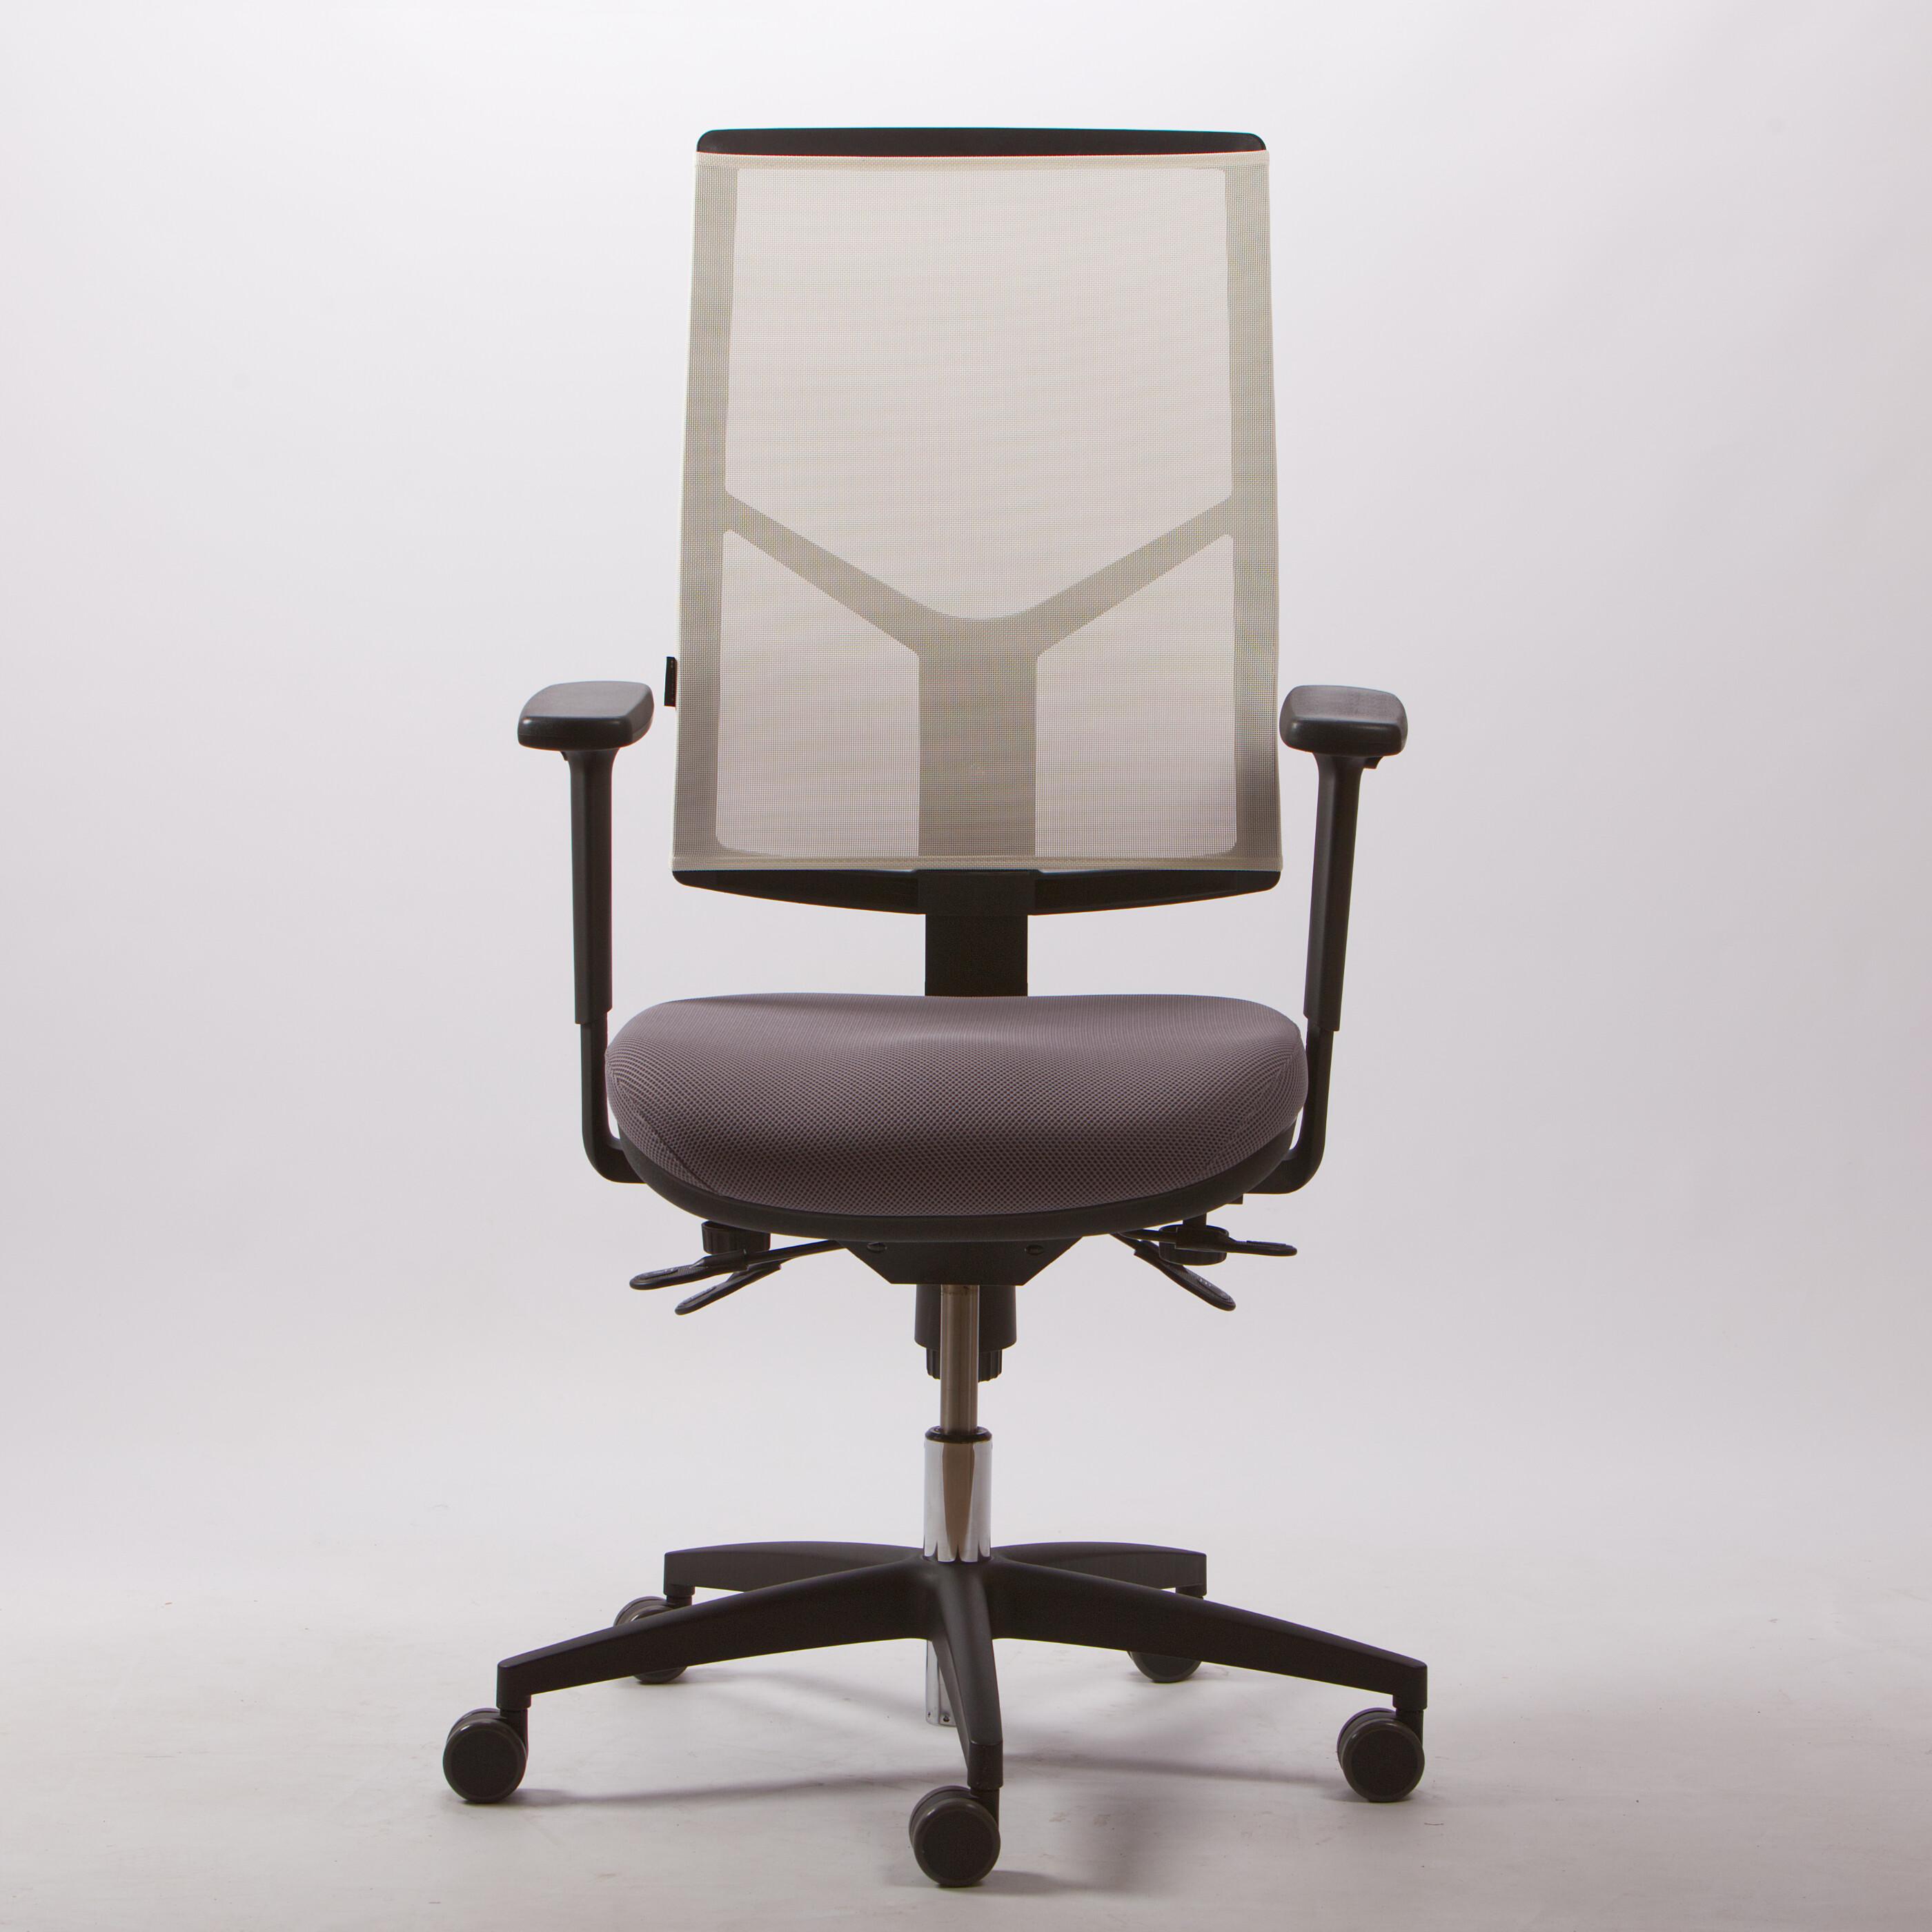 TERGON Bürostuhl T4.1RM Ergoprotection 01